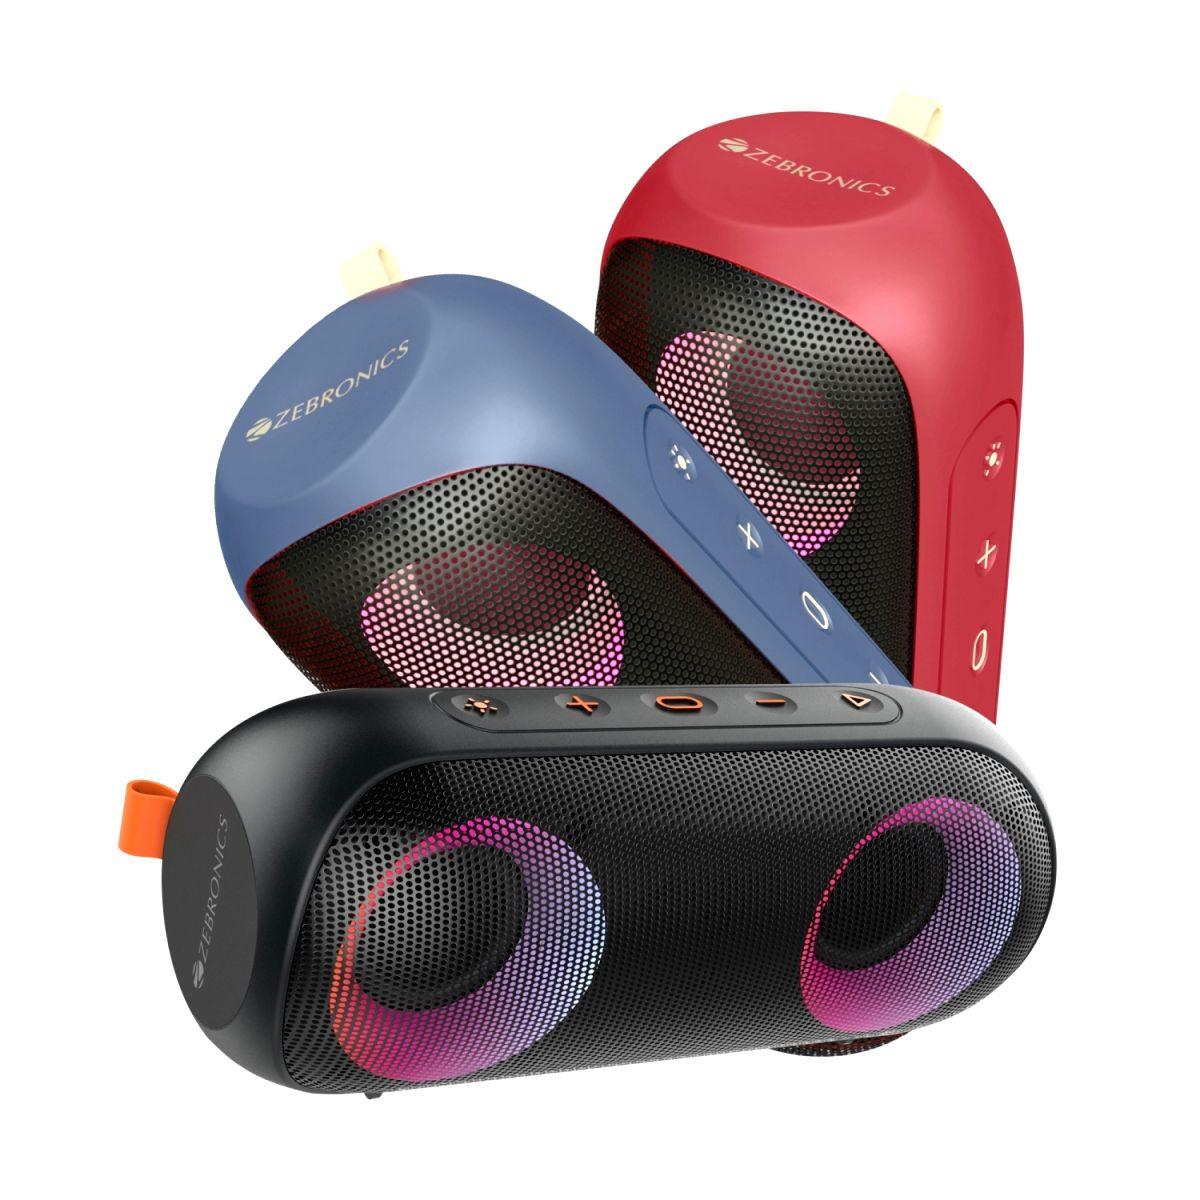 Zebronics launches powerful speaker Zeb-Music Bomb X with IPX7 rating